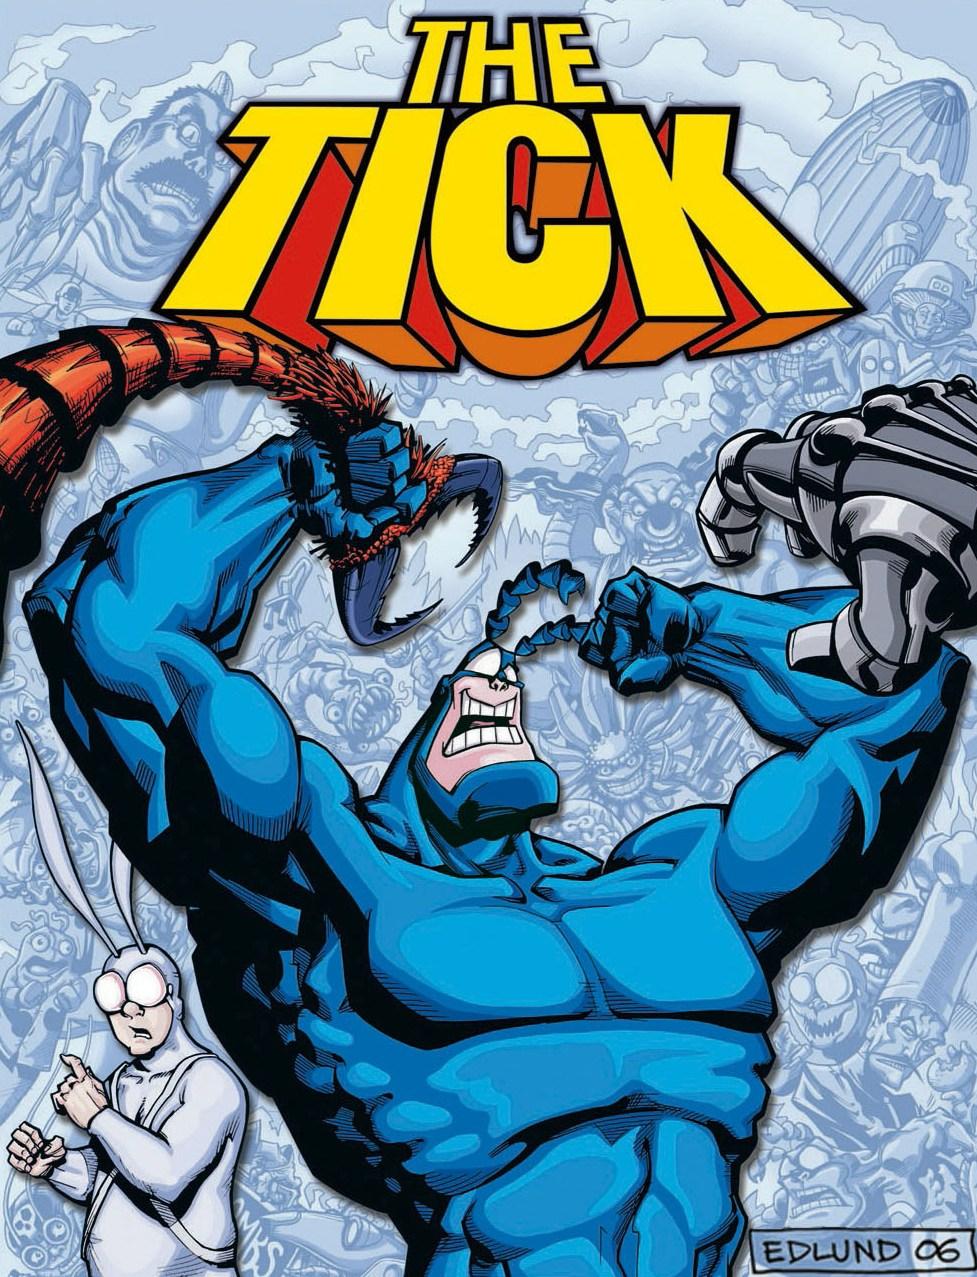 The Tick (TV Series 1994–1997) - IMDb